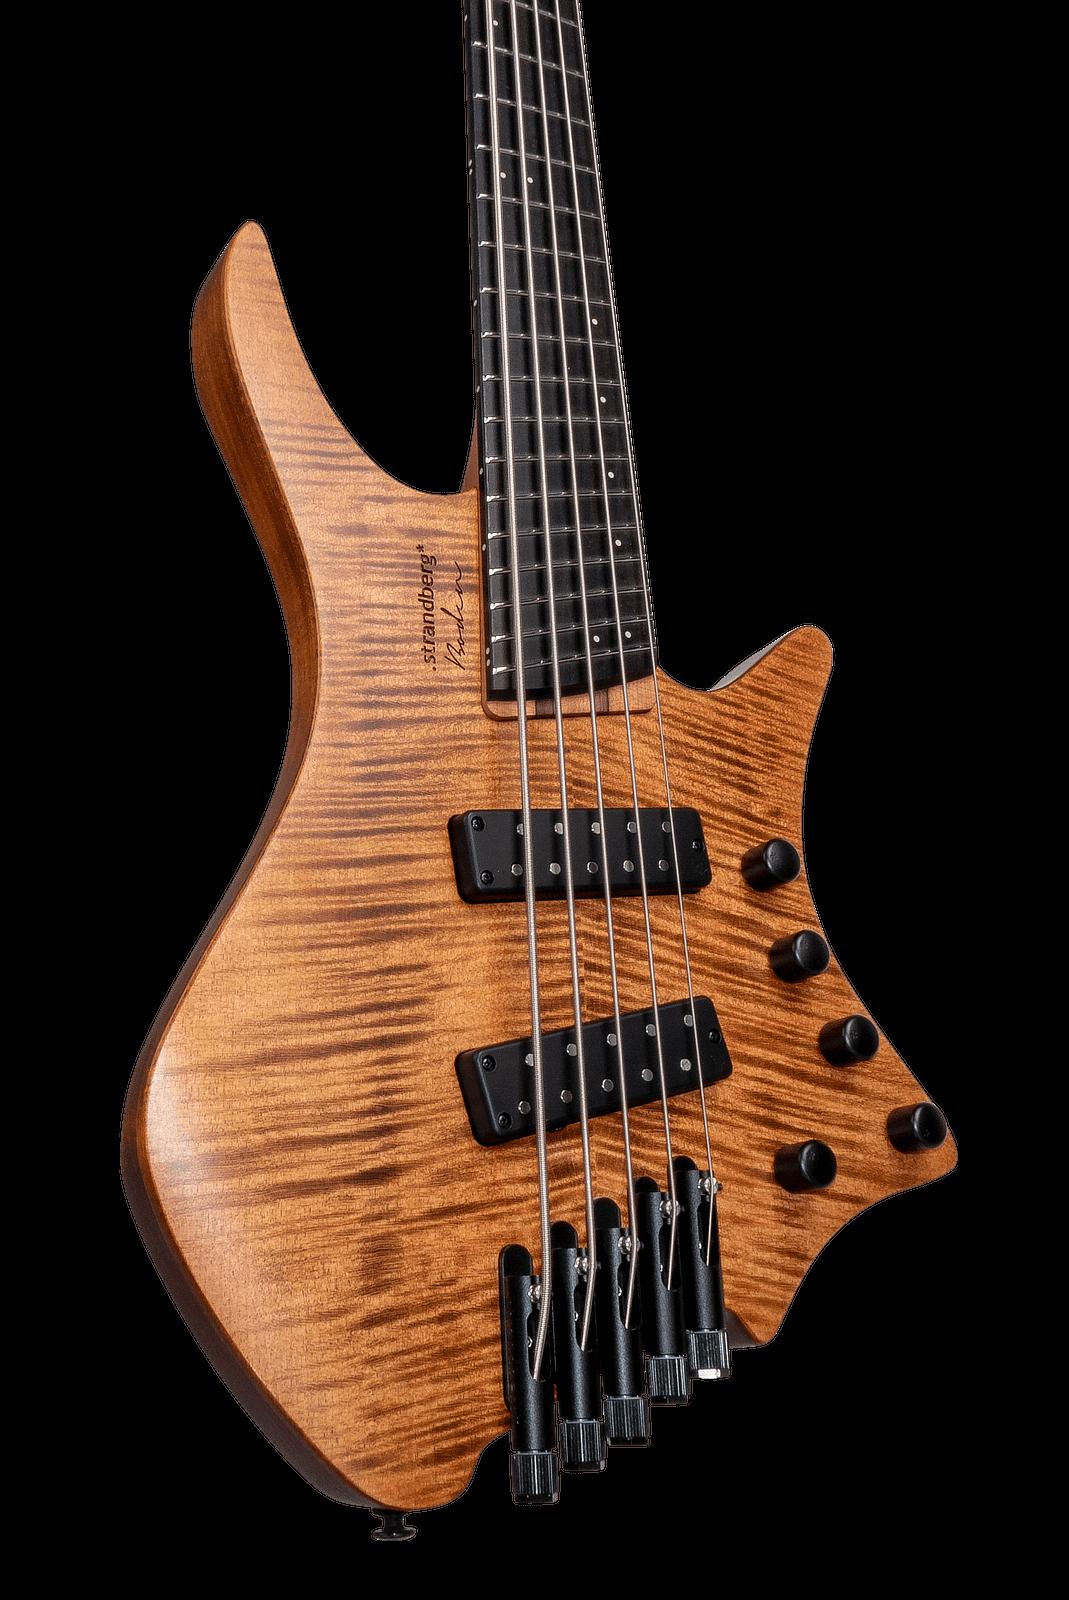 boden bass prog 5 brown strandberg guitars australia. Black Bedroom Furniture Sets. Home Design Ideas